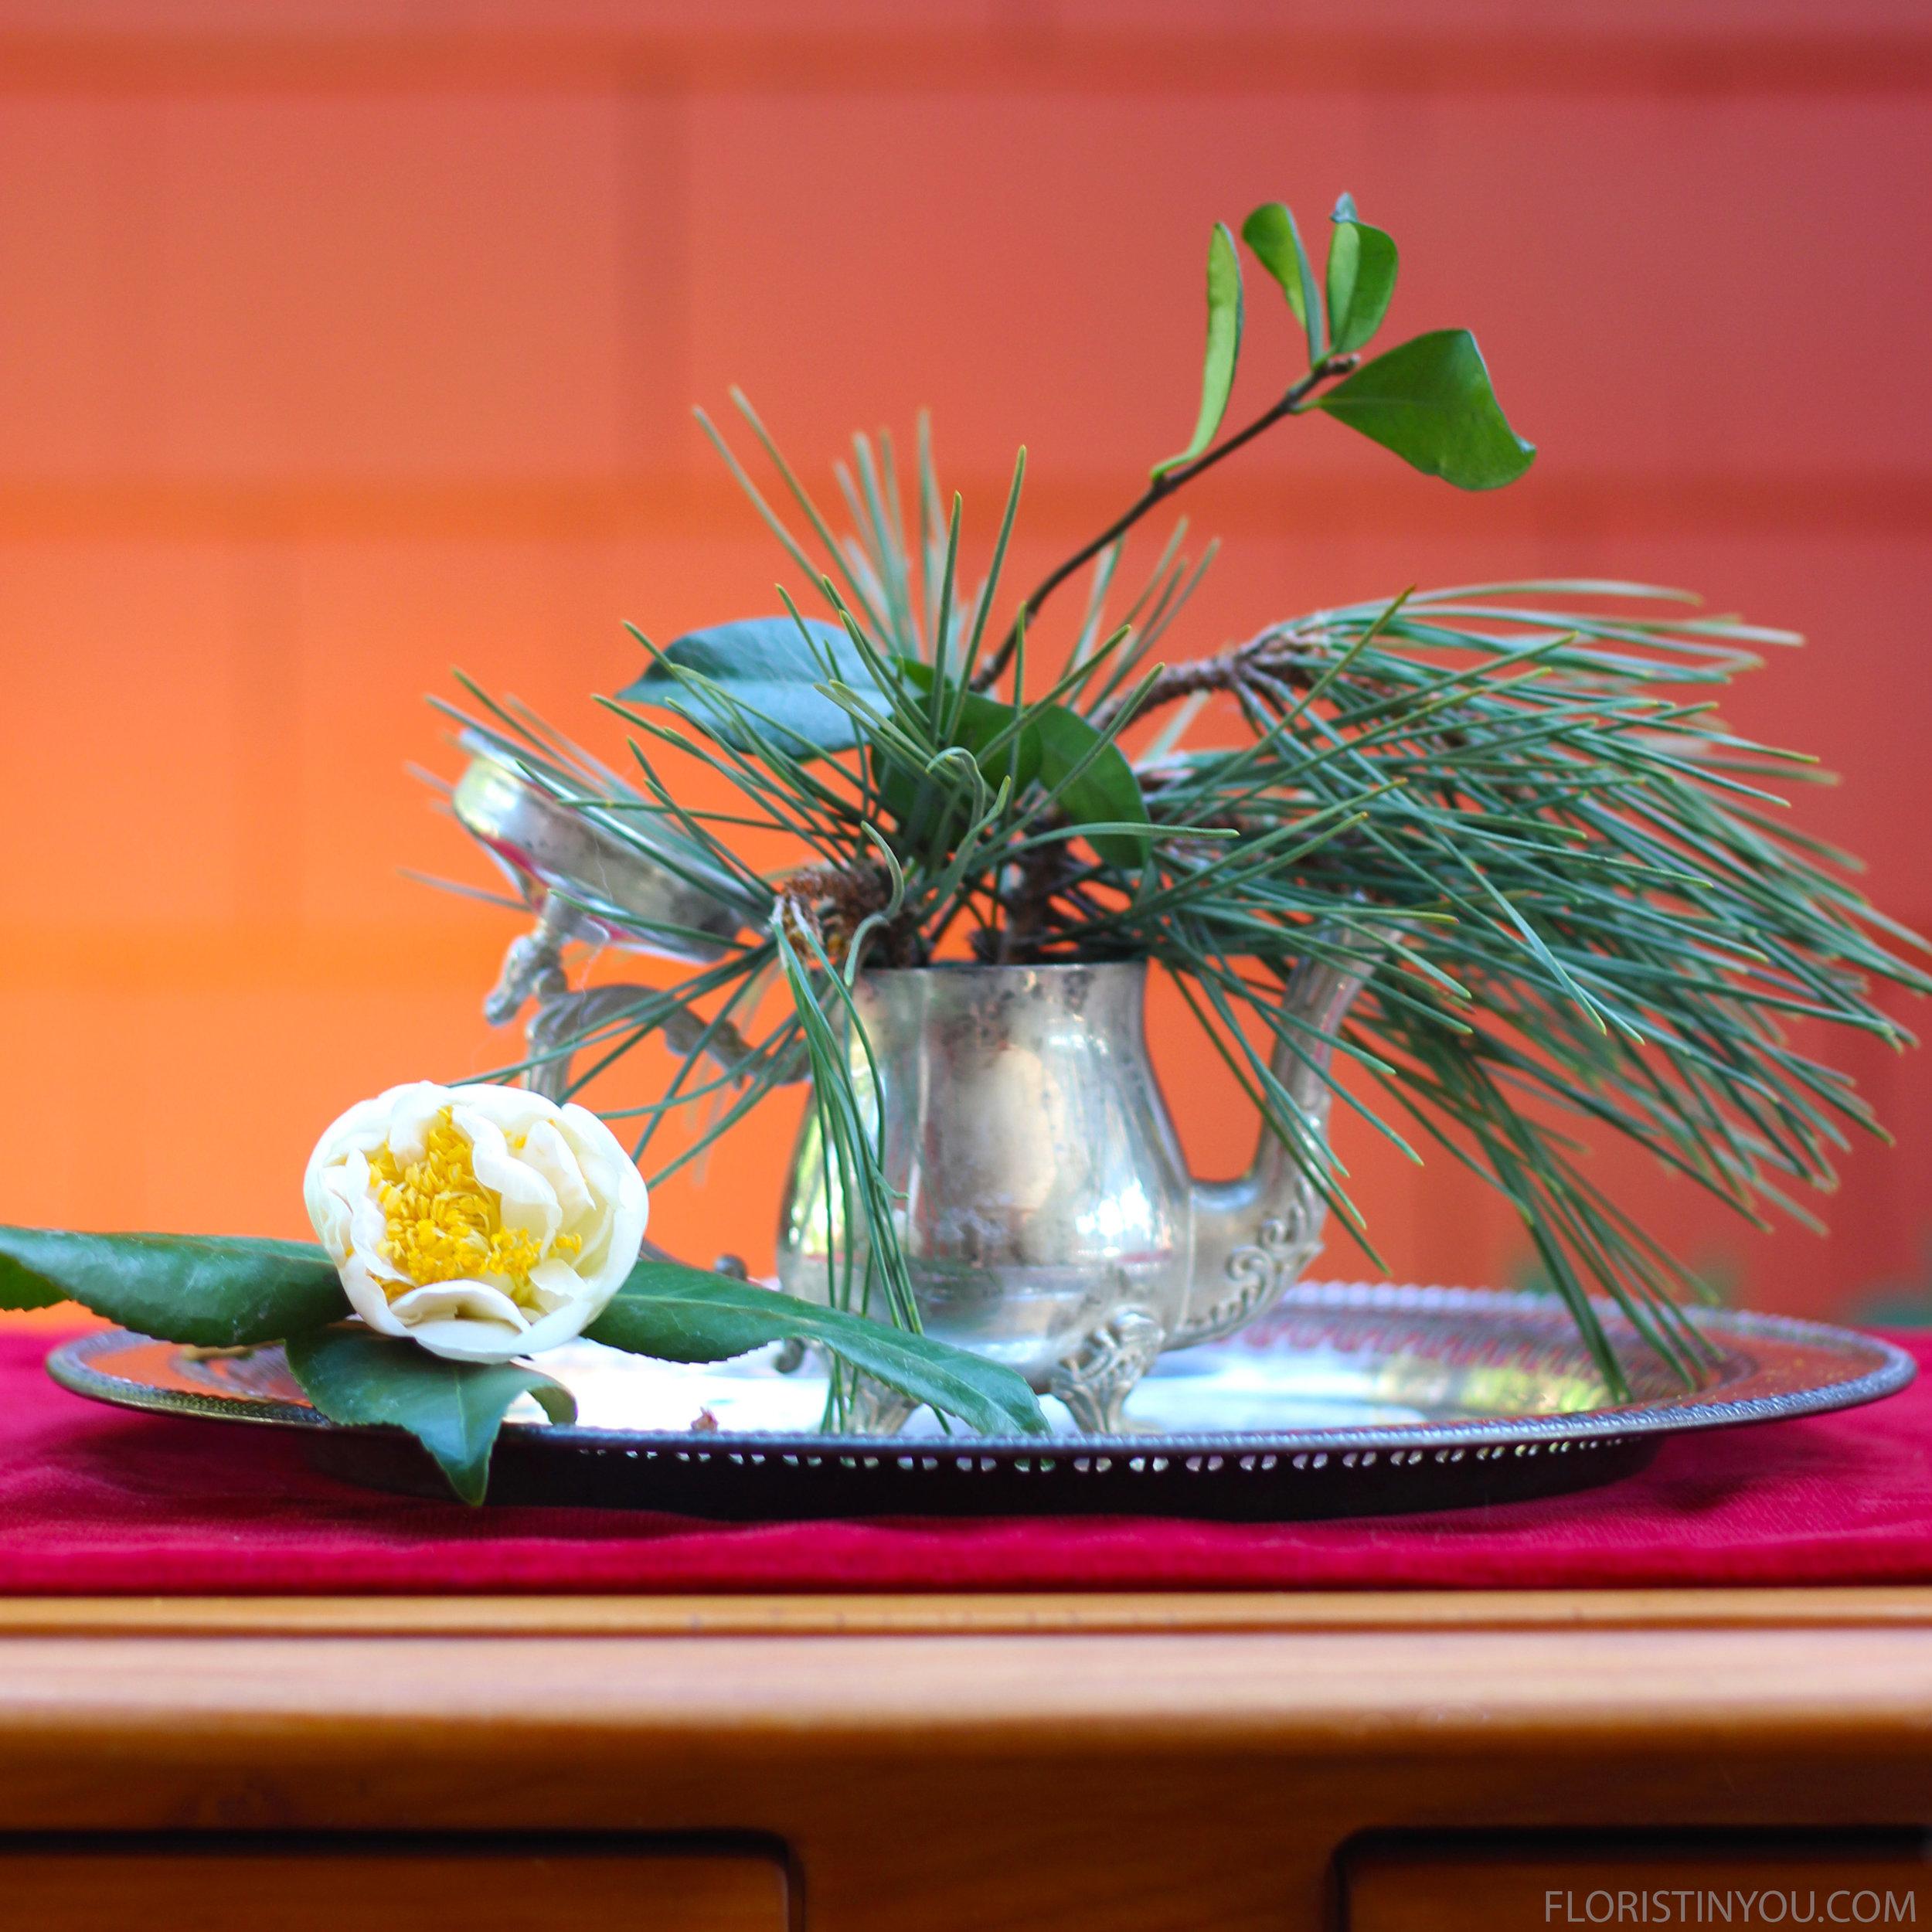 For the tiny tea pot, insert Pine and Jasmin.